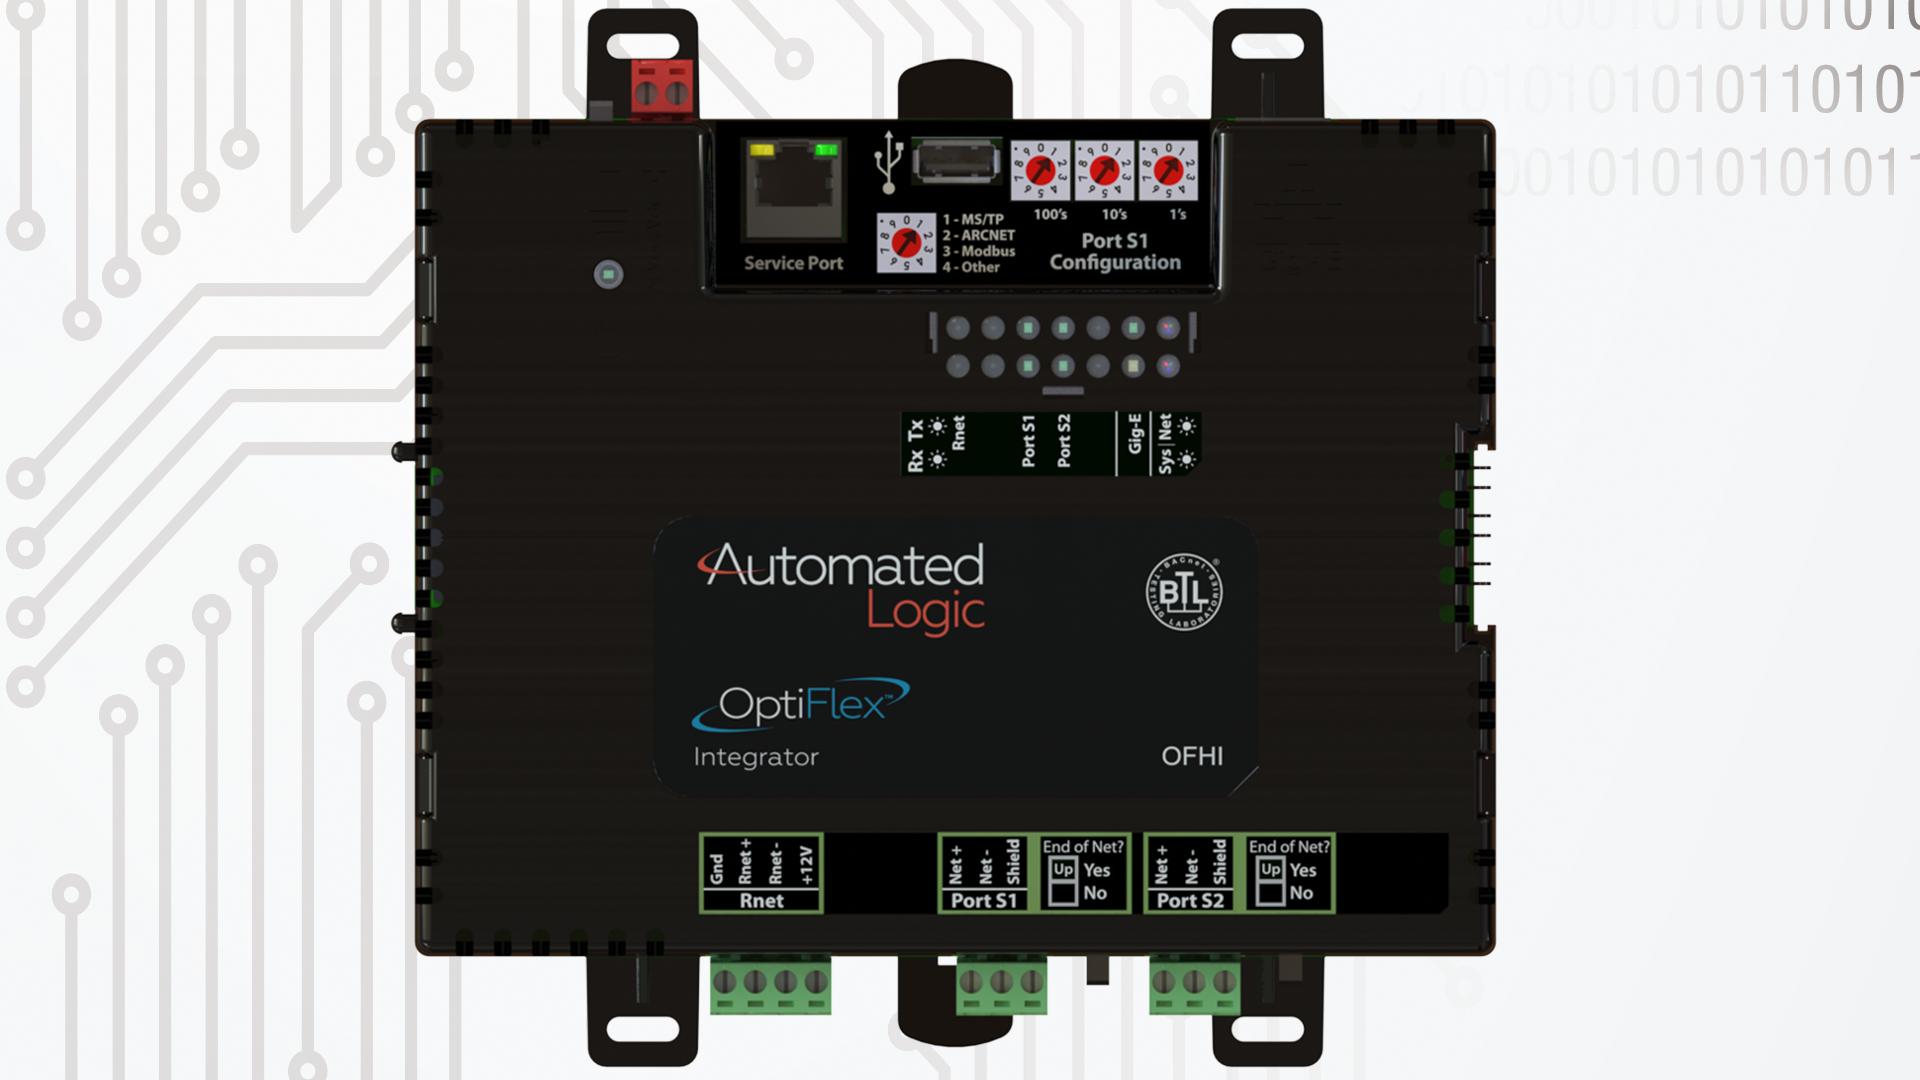 OptiFlex-BACnet-Integrator-model-OFHI-top-view